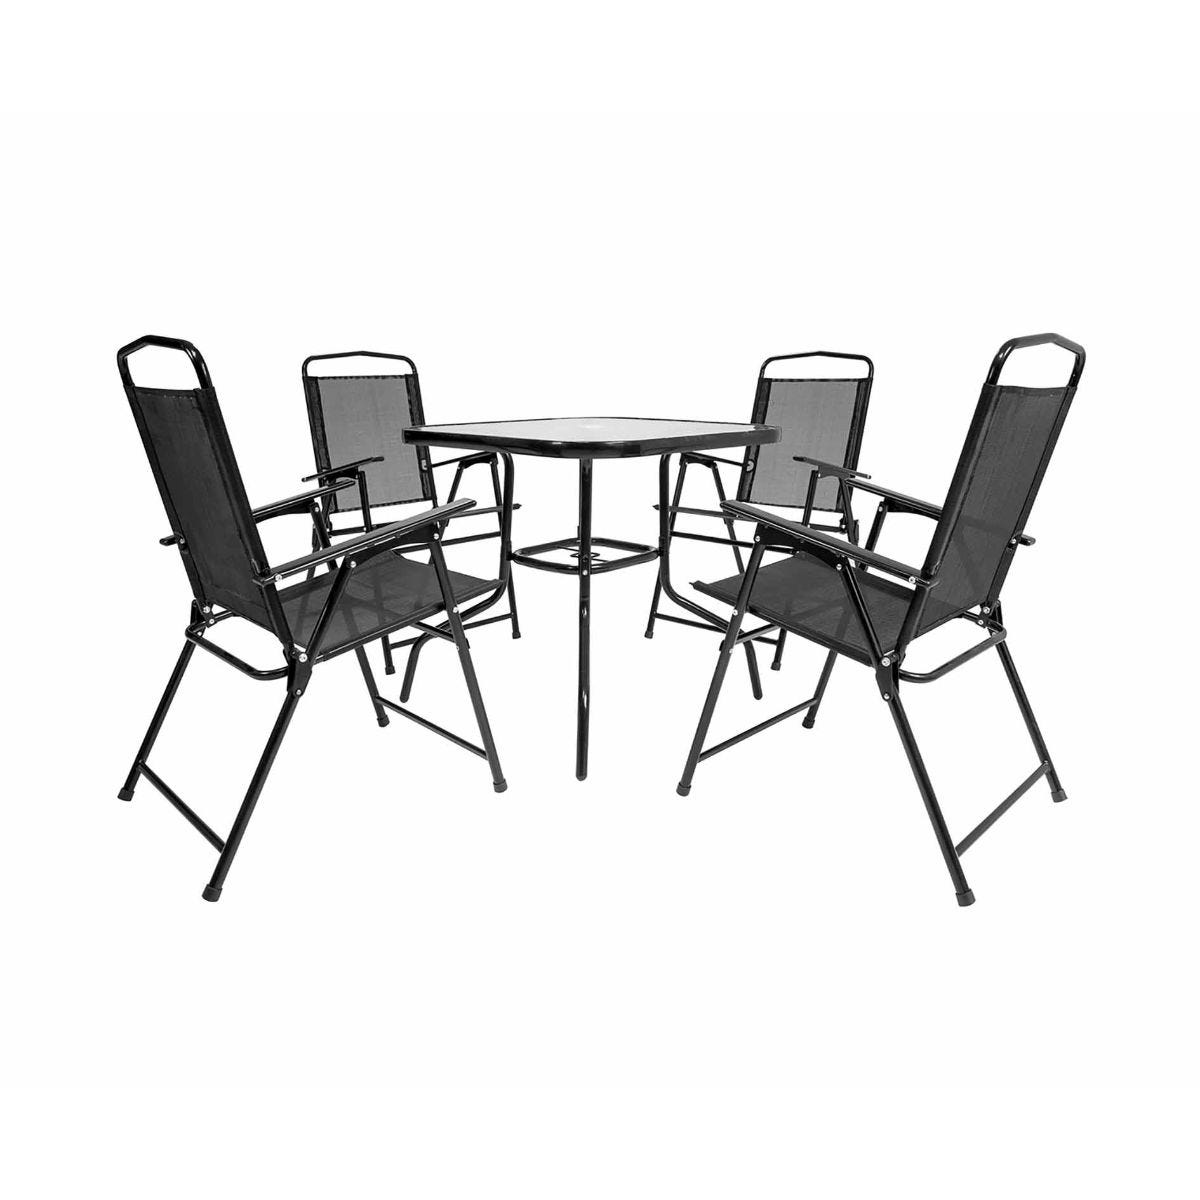 Charles Bentley Garden Mesh Square 4 Seater Dining Set, Black